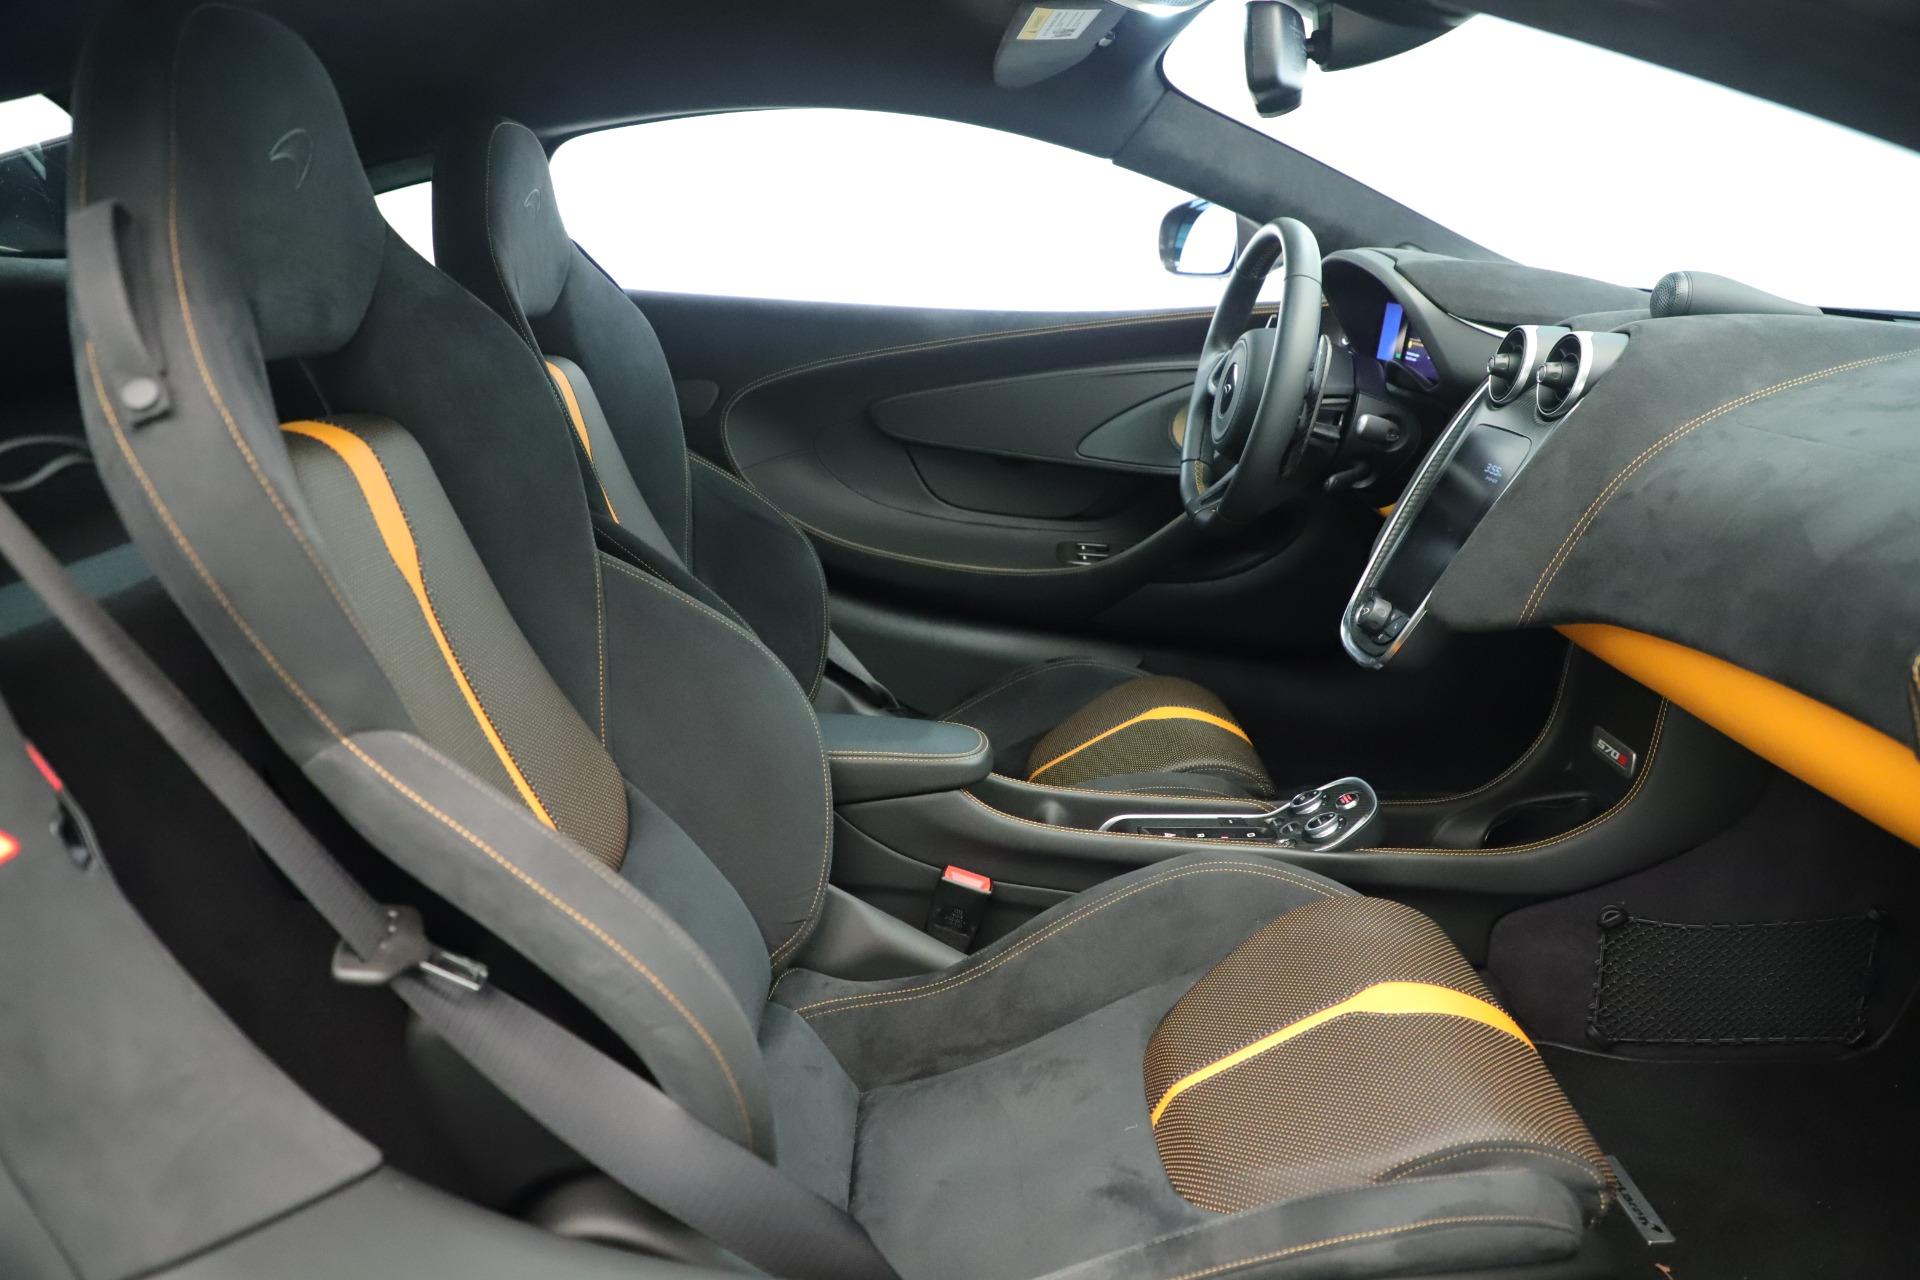 Used 2016 McLaren 570S Coupe For Sale In Westport, CT 3433_p17